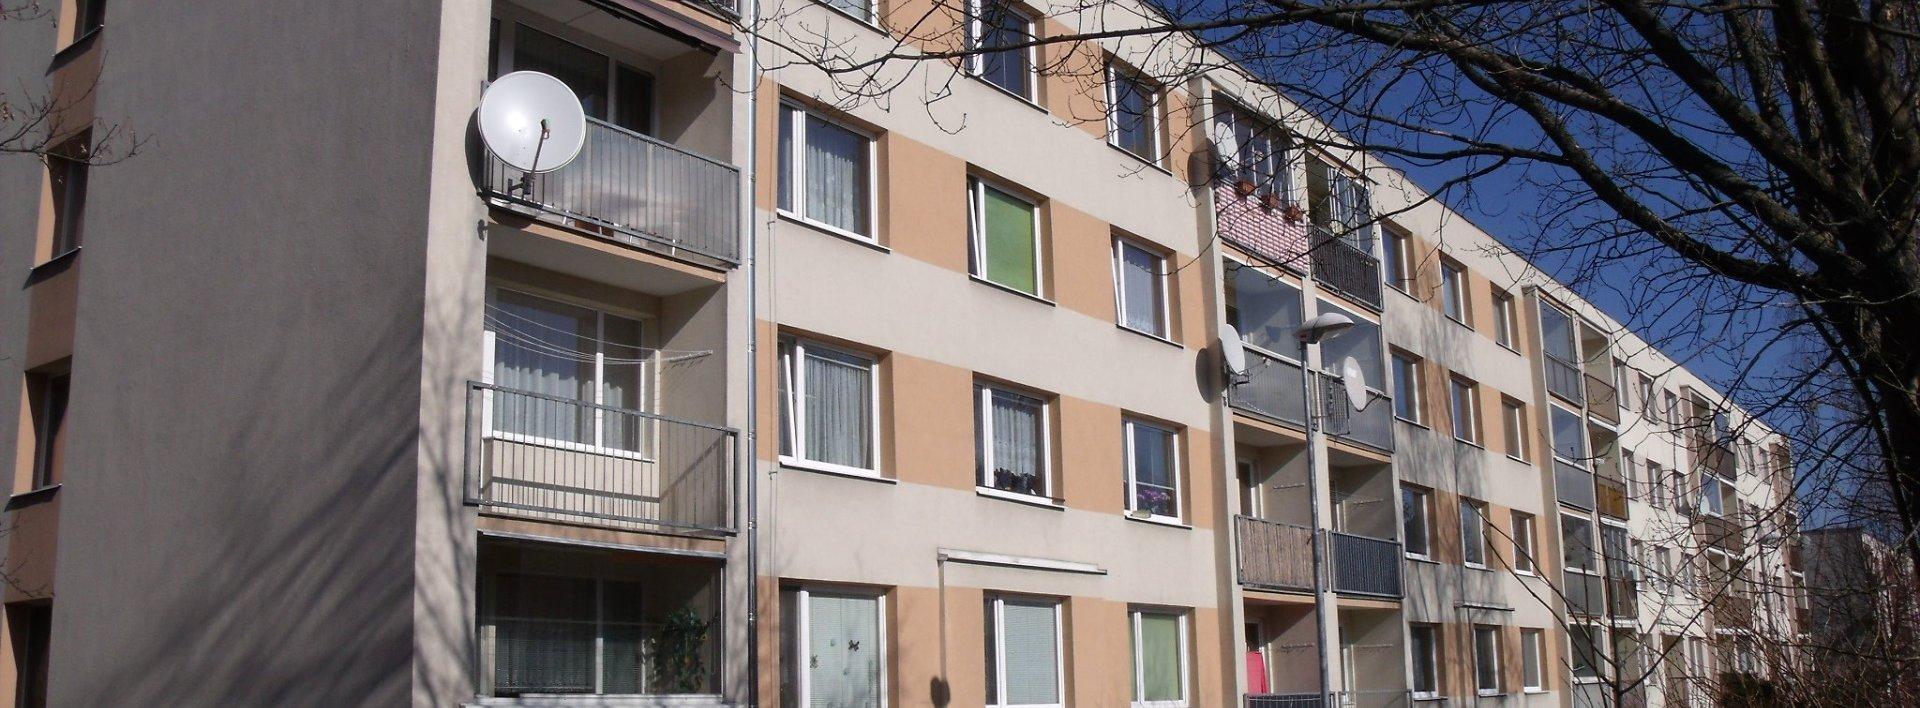 Pronájem bytu 1+1, ul. Gagarinova, Liberec VI-Rochlice, Ev.č.: N48682